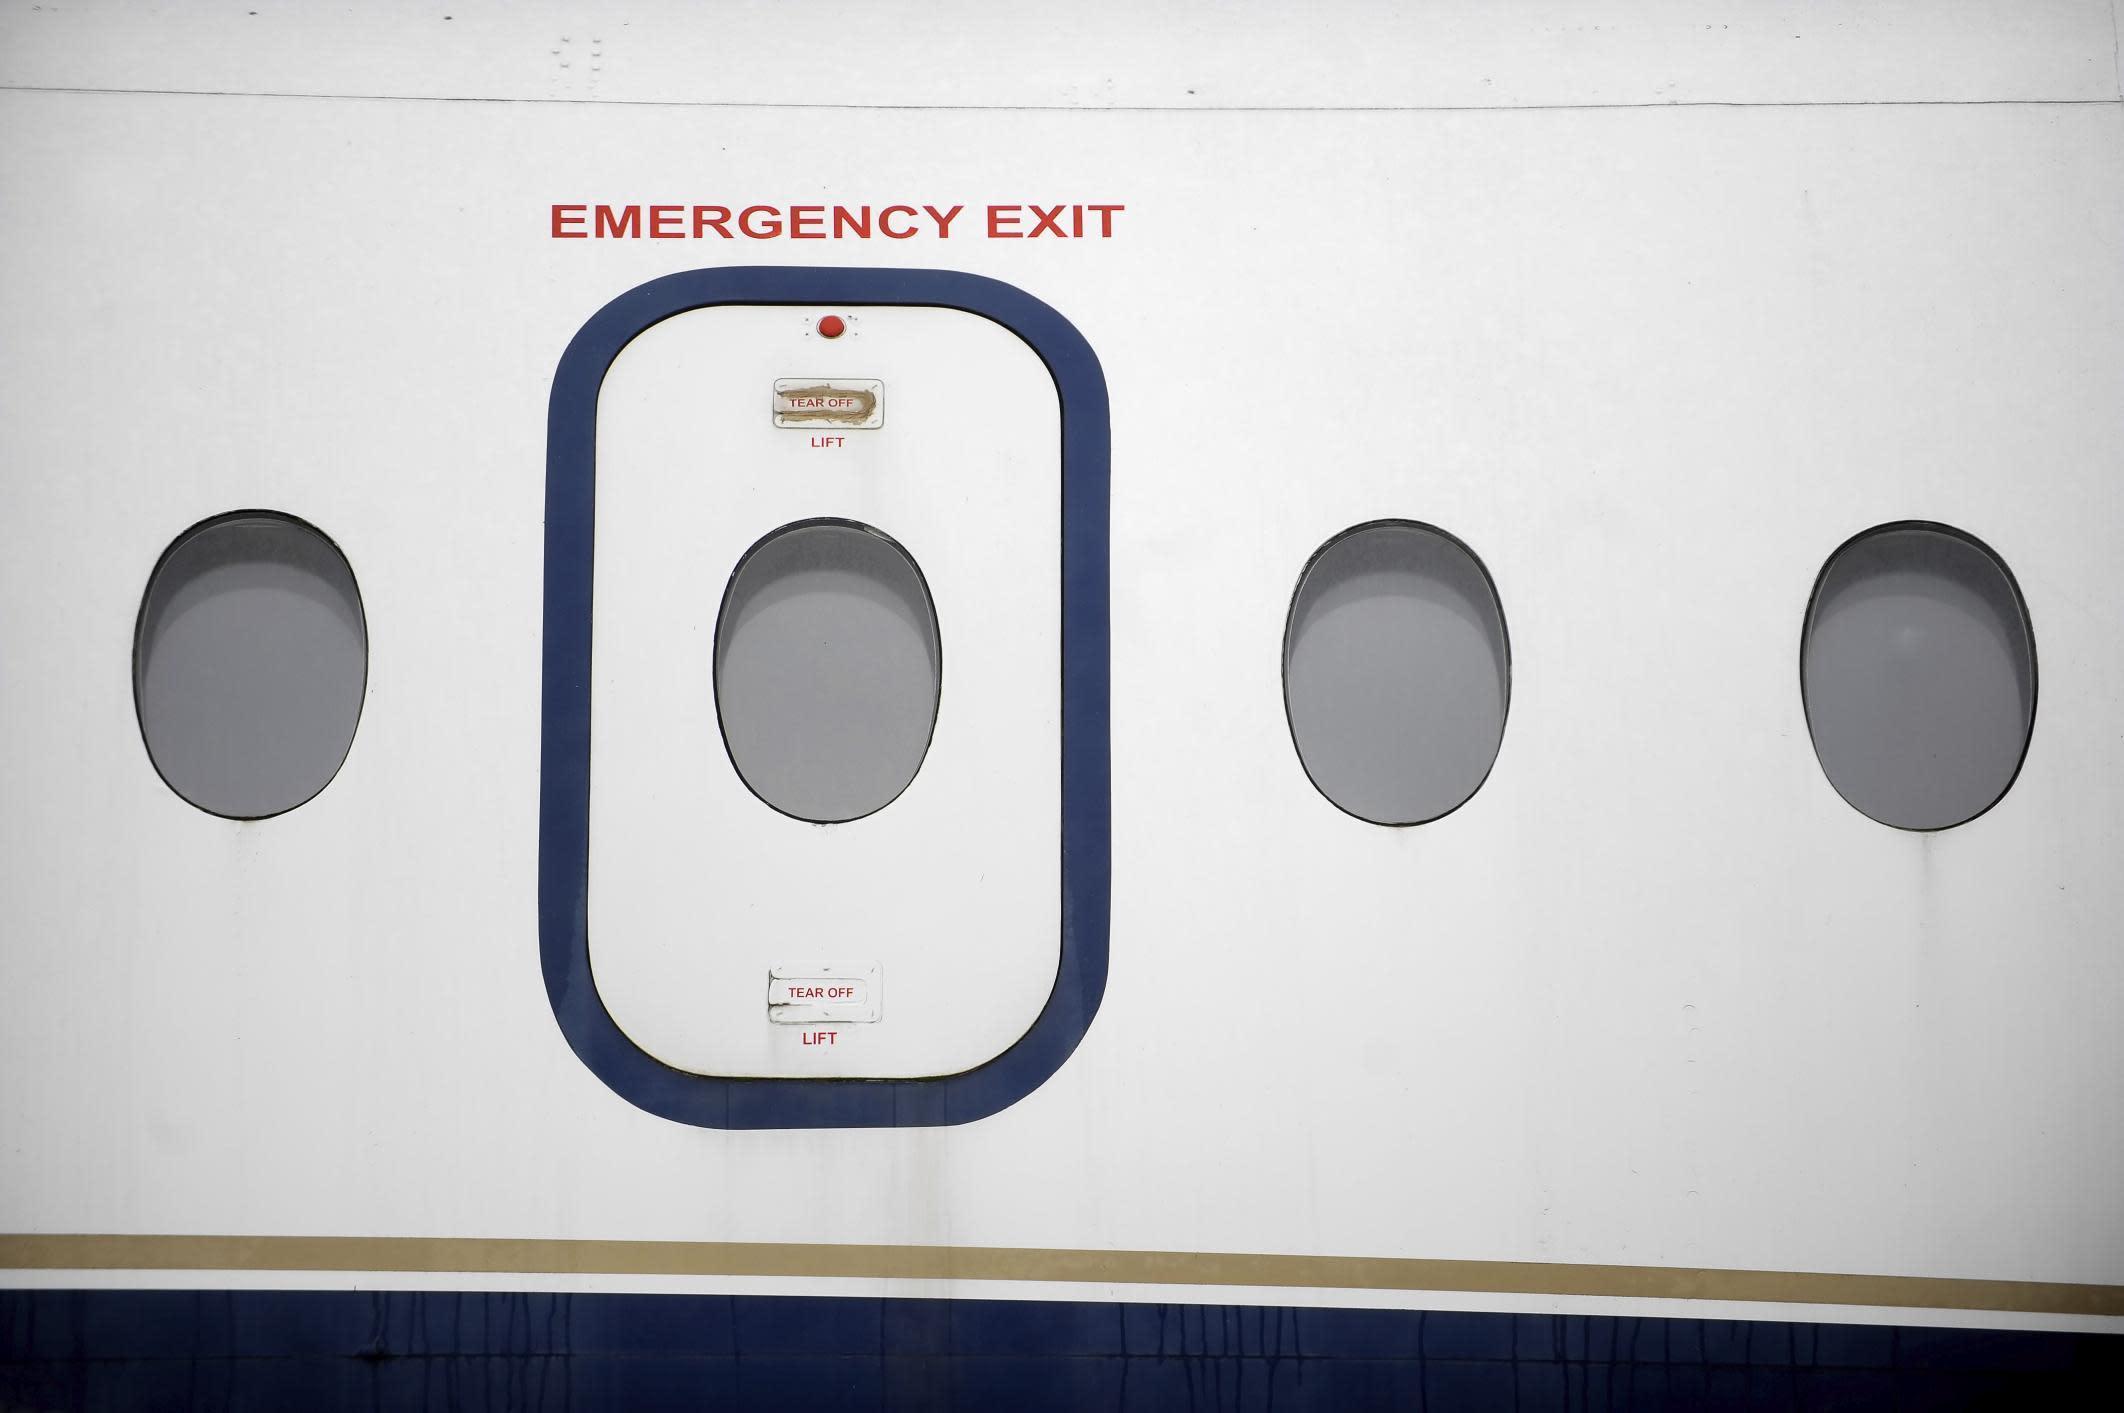 & Passenger Jokes About Opening Plane Door \u2014 Airline Calls Police Pezcame.Com